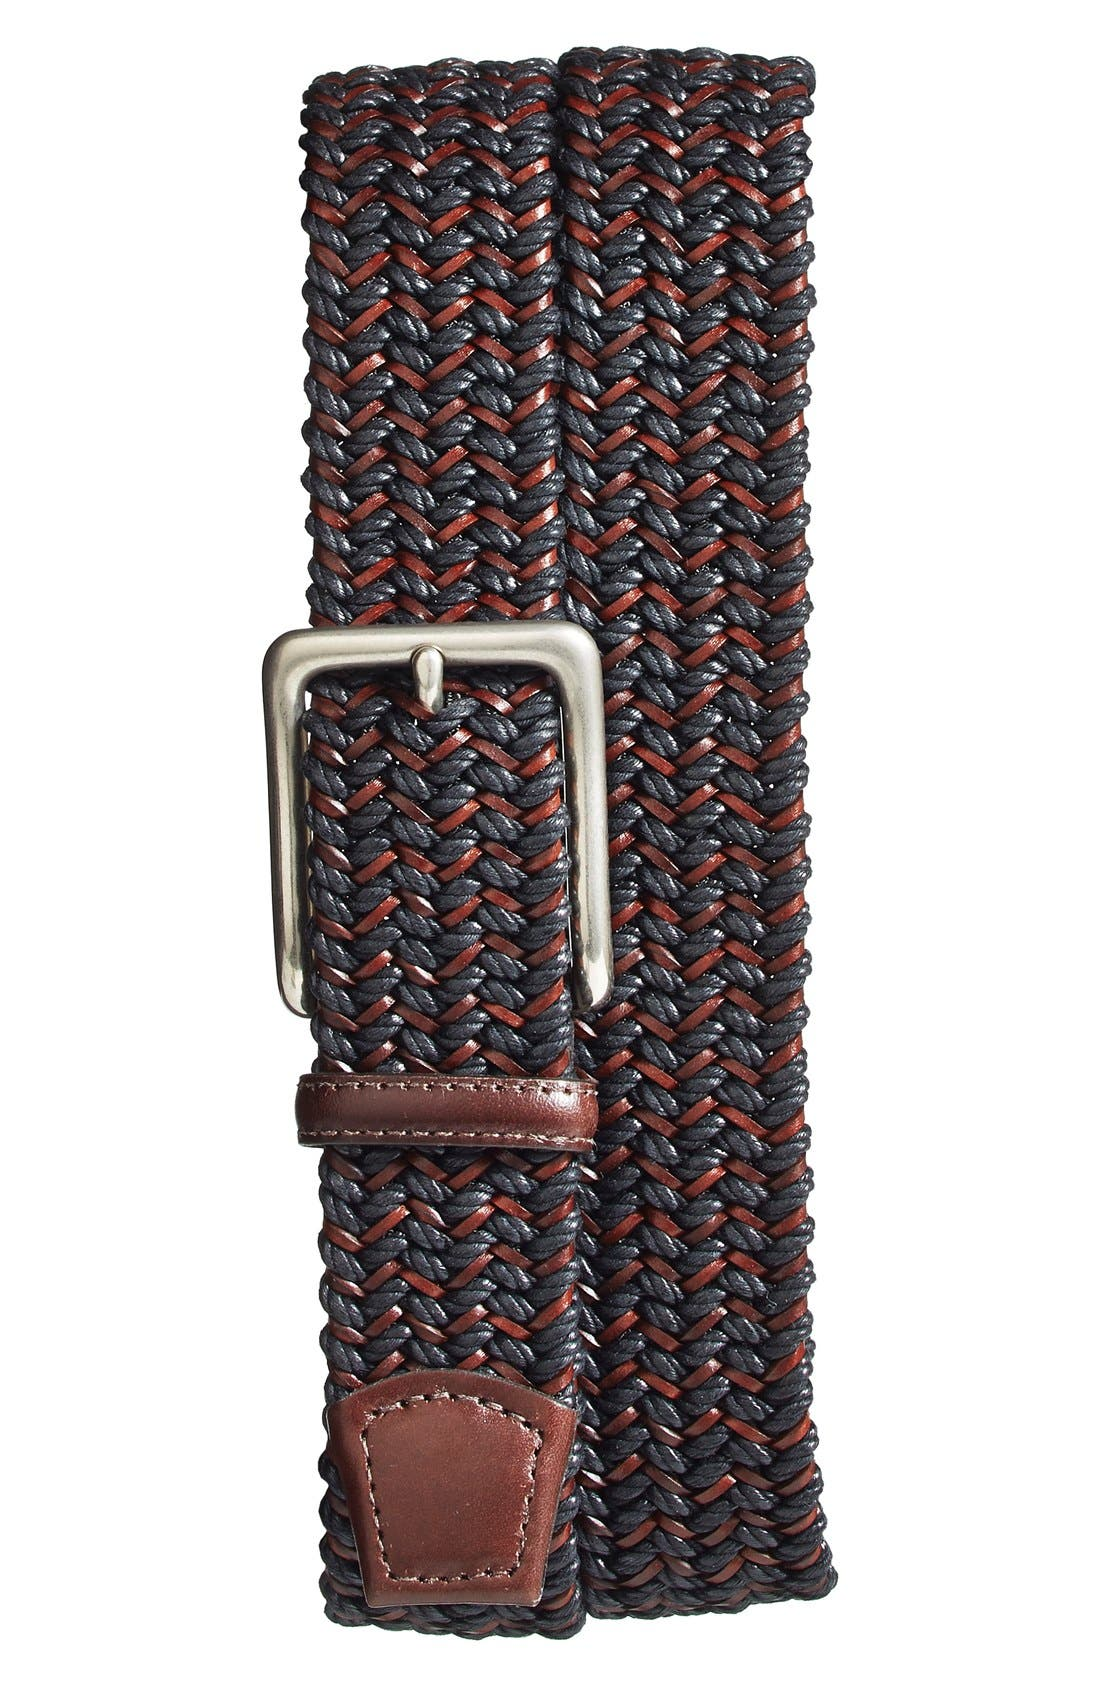 Torino Belts Woven & Leather Belt, Black/ Brown